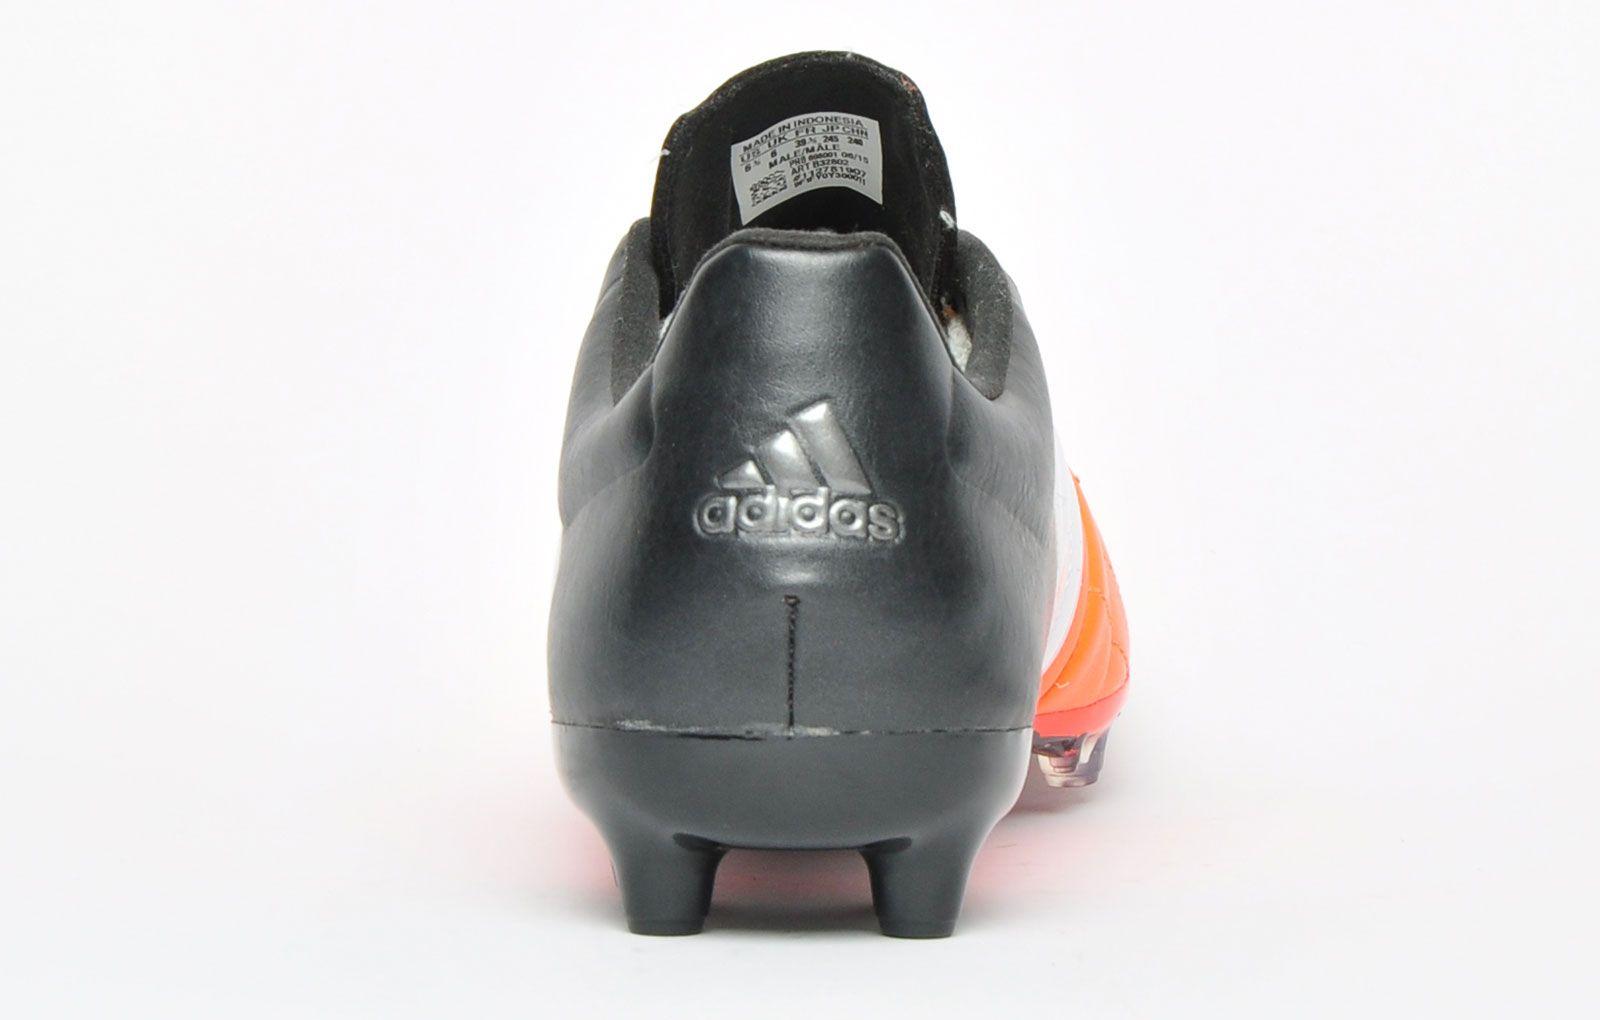 Adidas Ace 15.2 FG / AG Leather Pro Mens